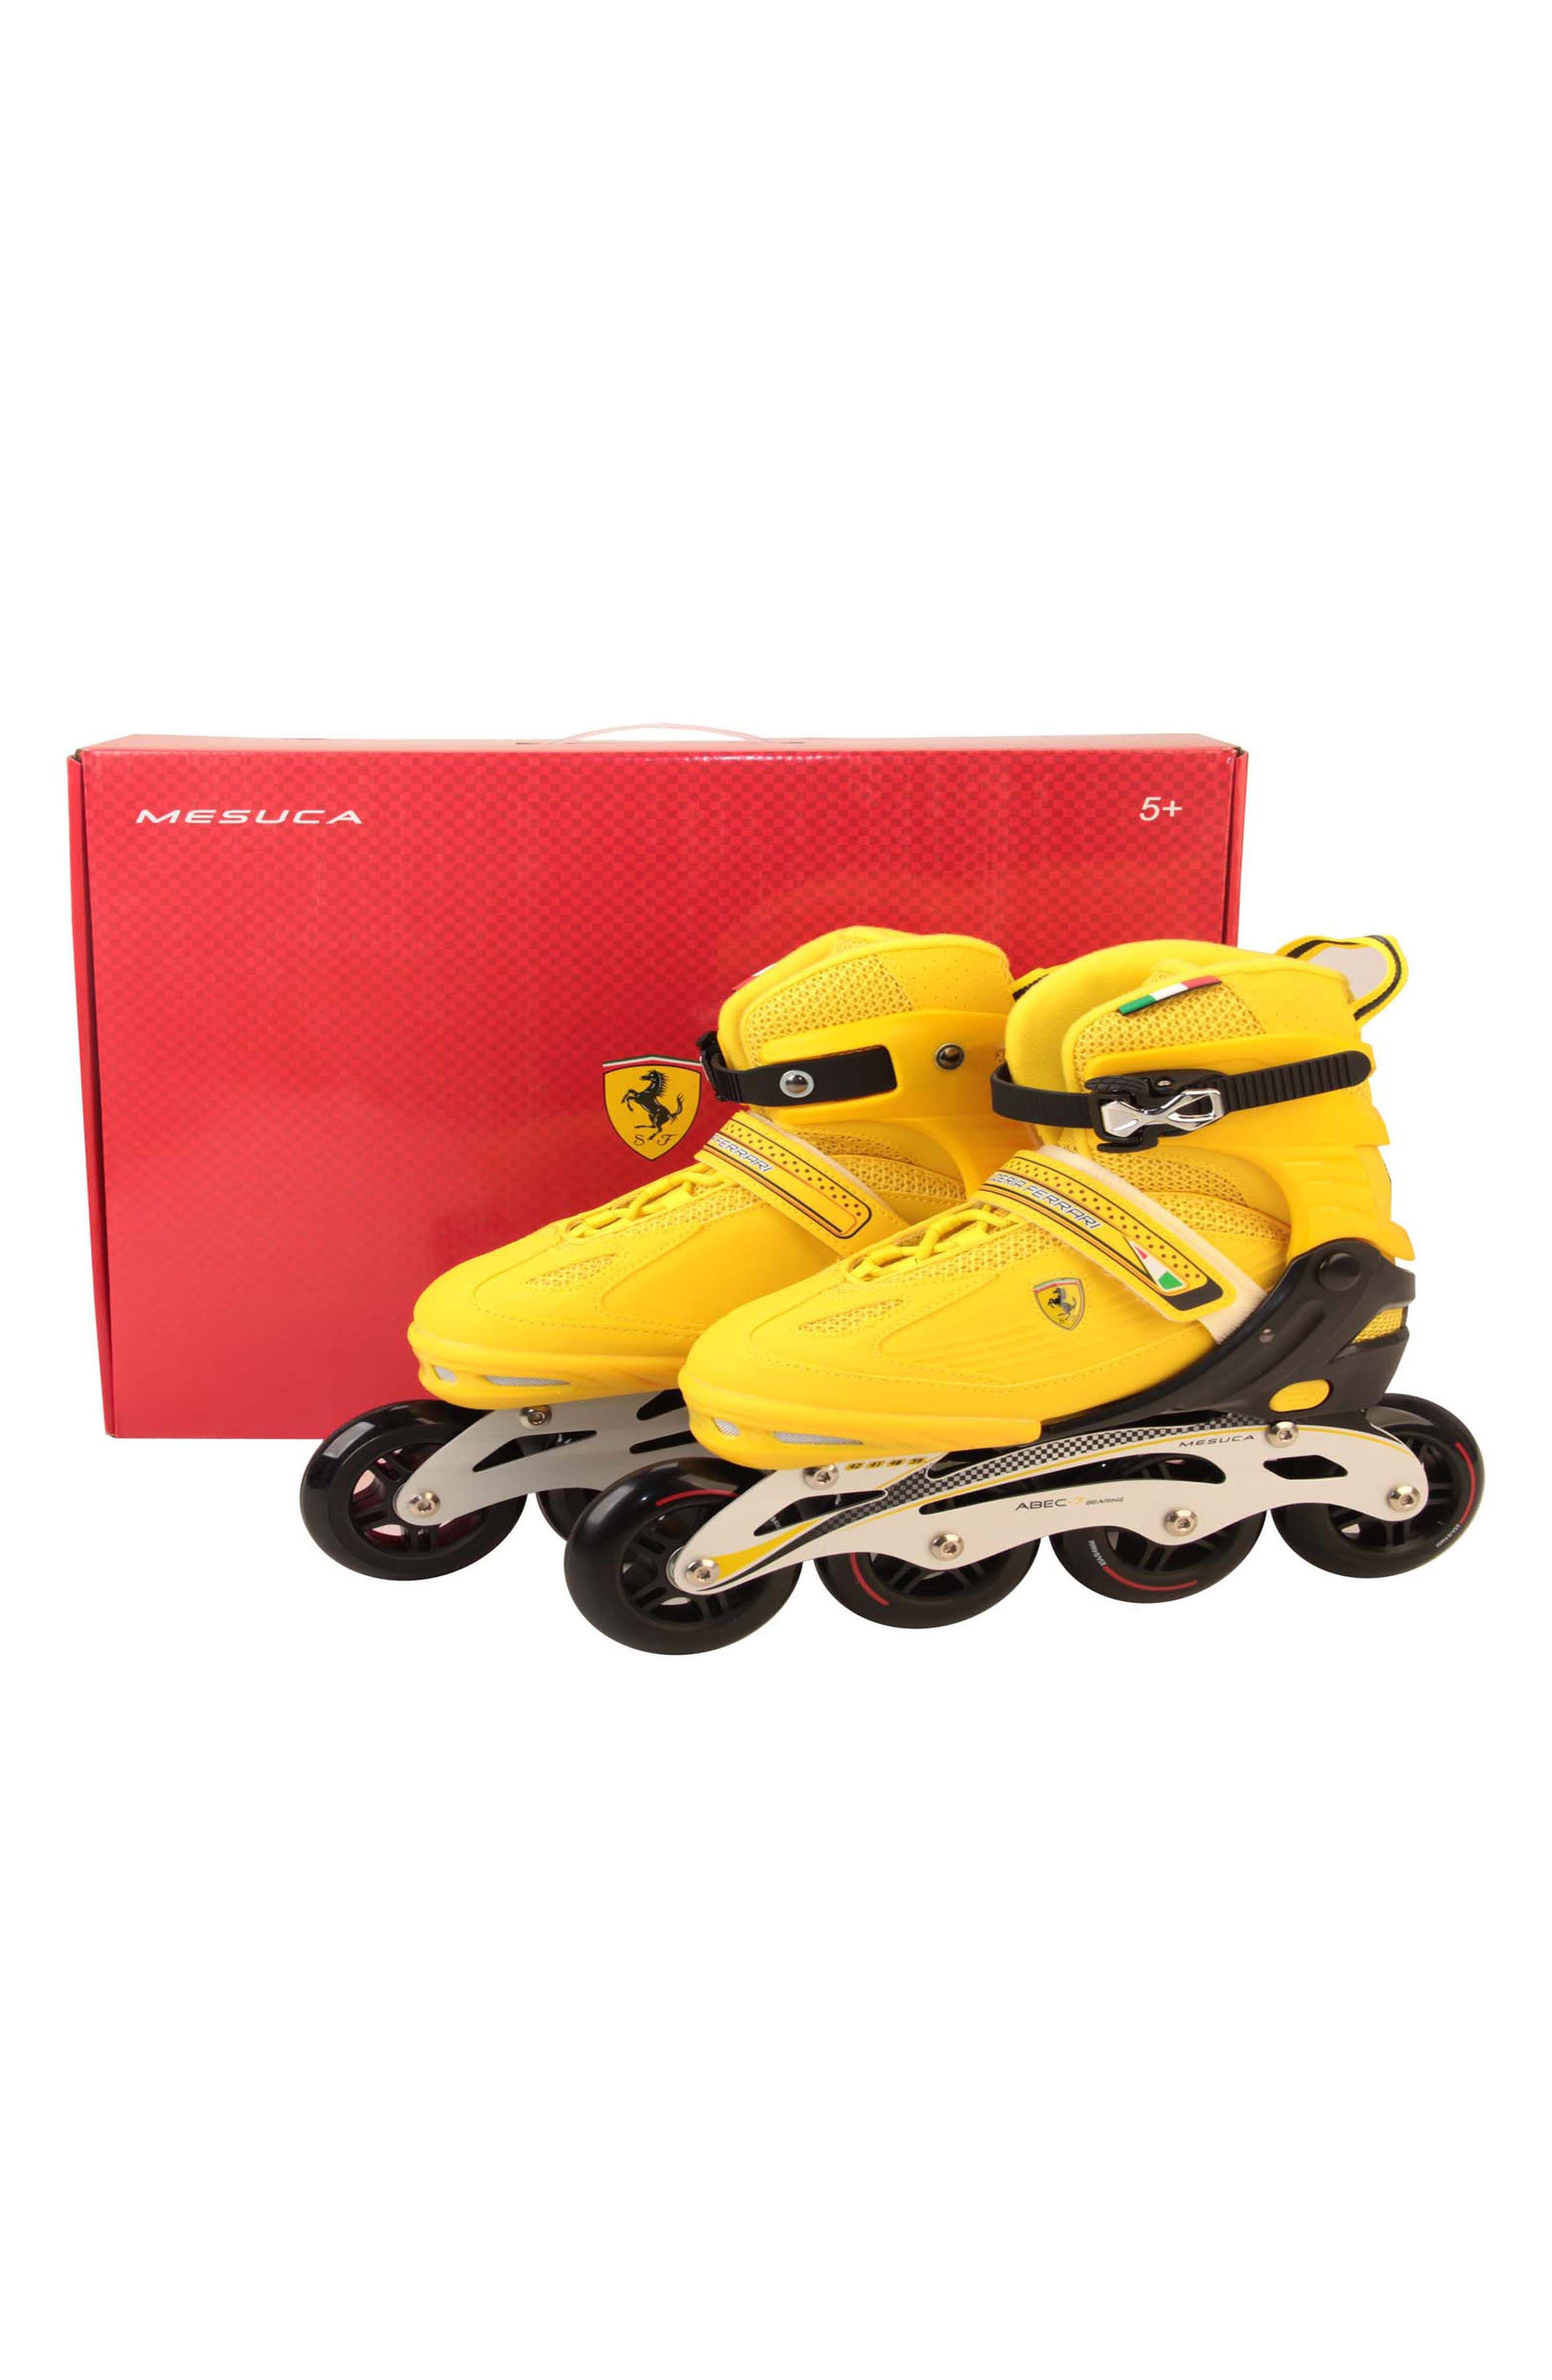 Main Image - Ferrari Inline Skates